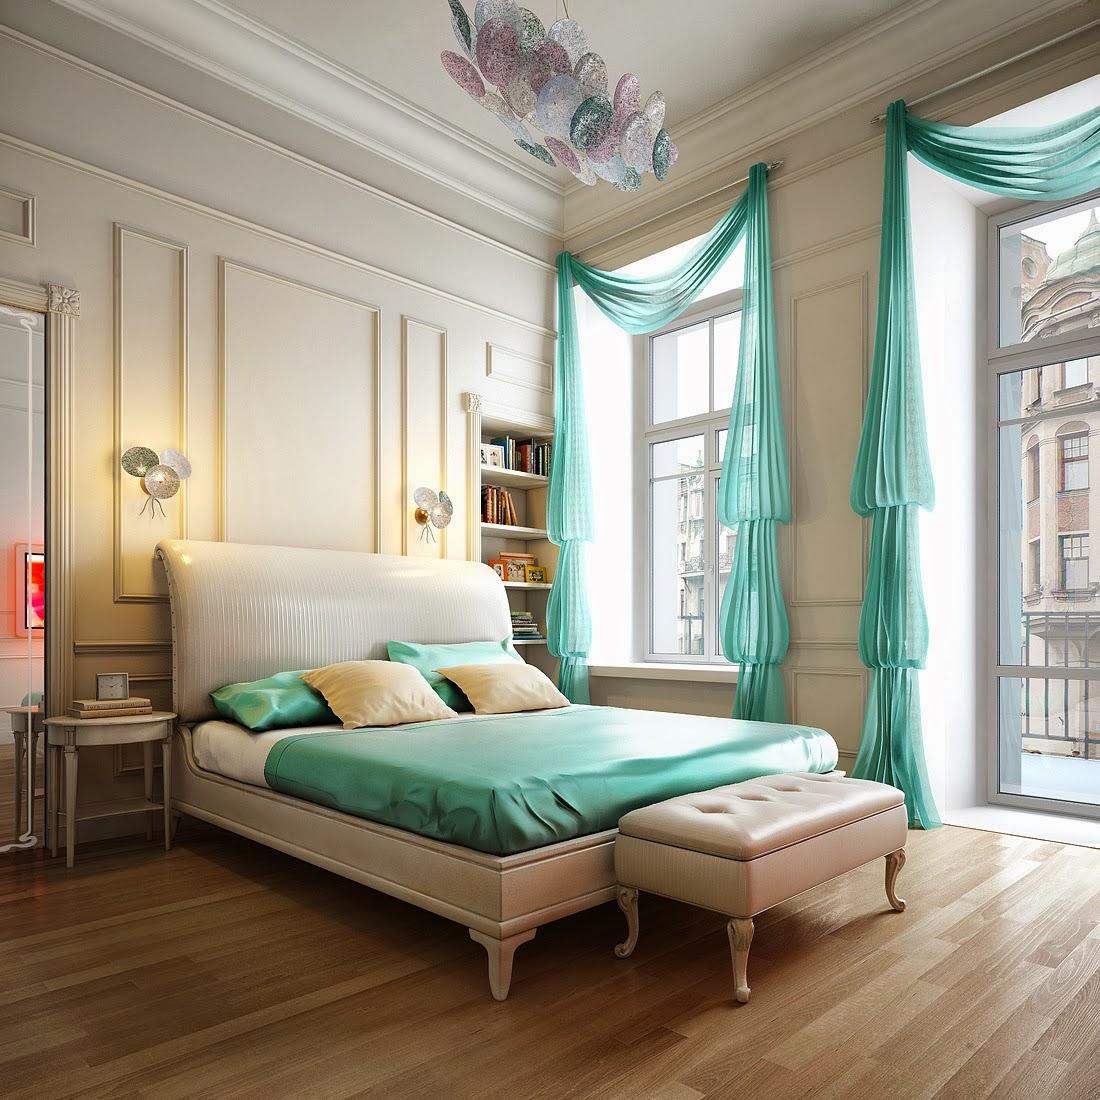 Chambres italienne 1.jpg